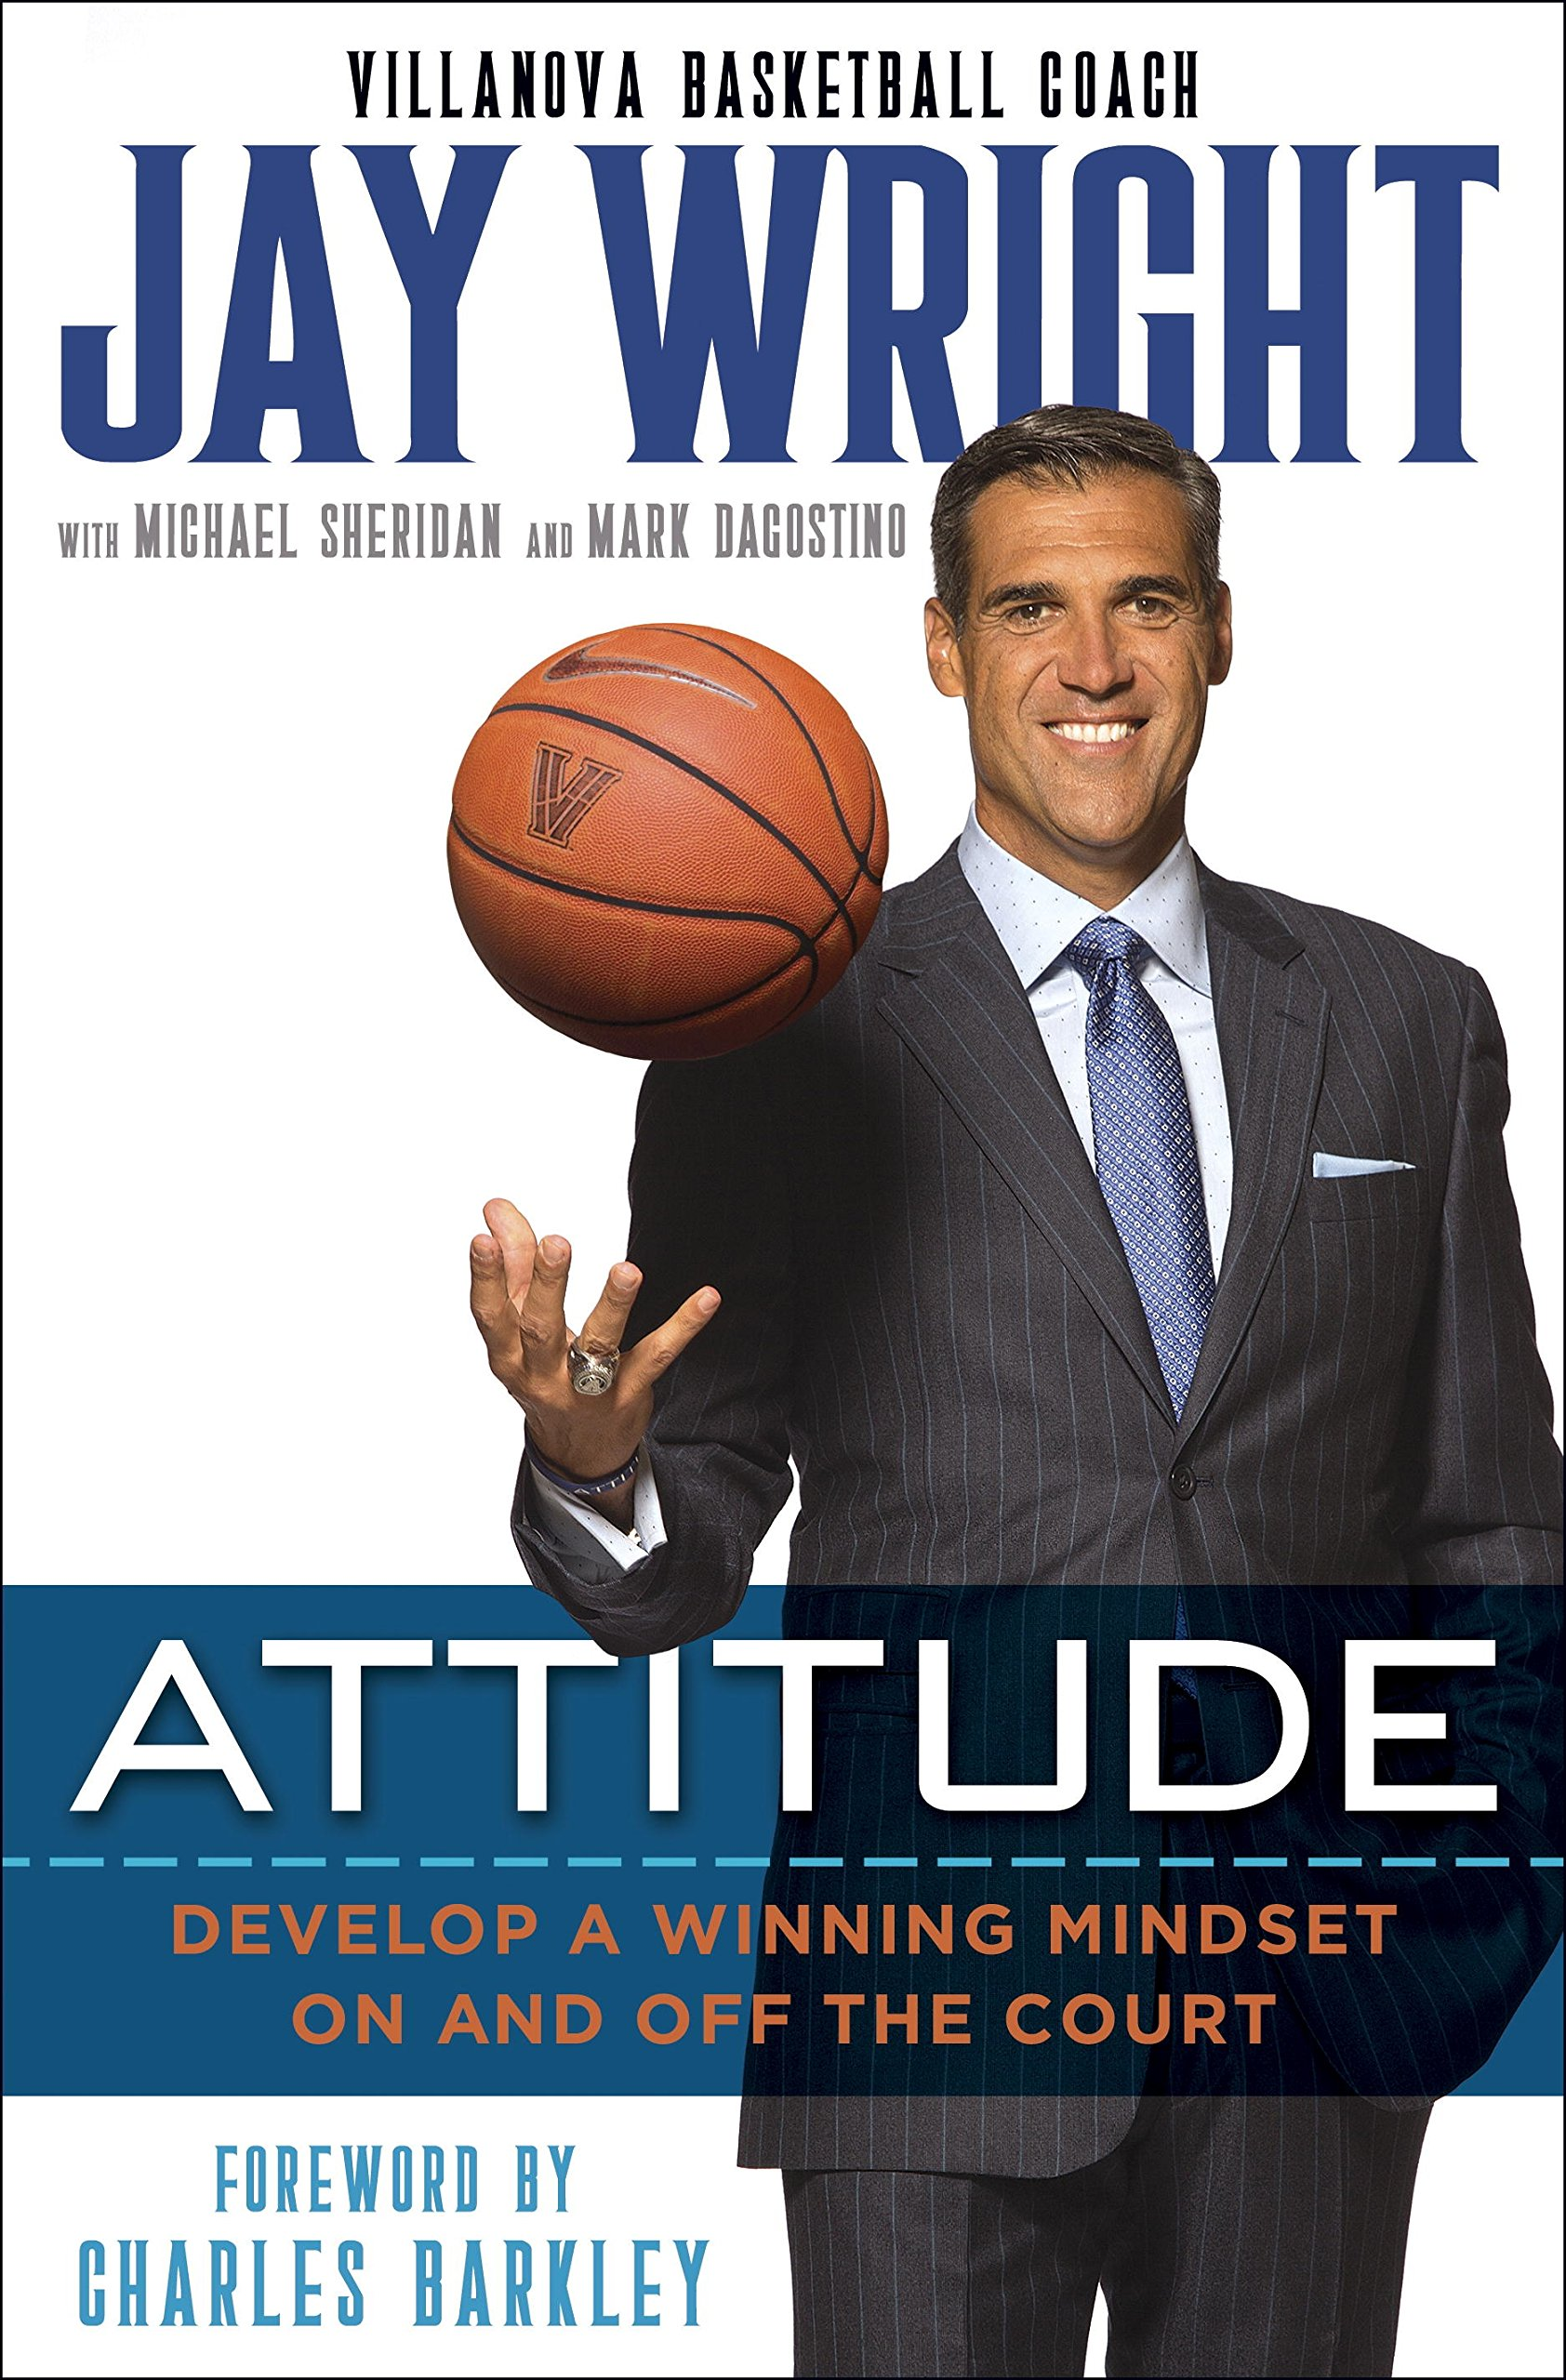 Attitude Develop Winning Mindset Court product image